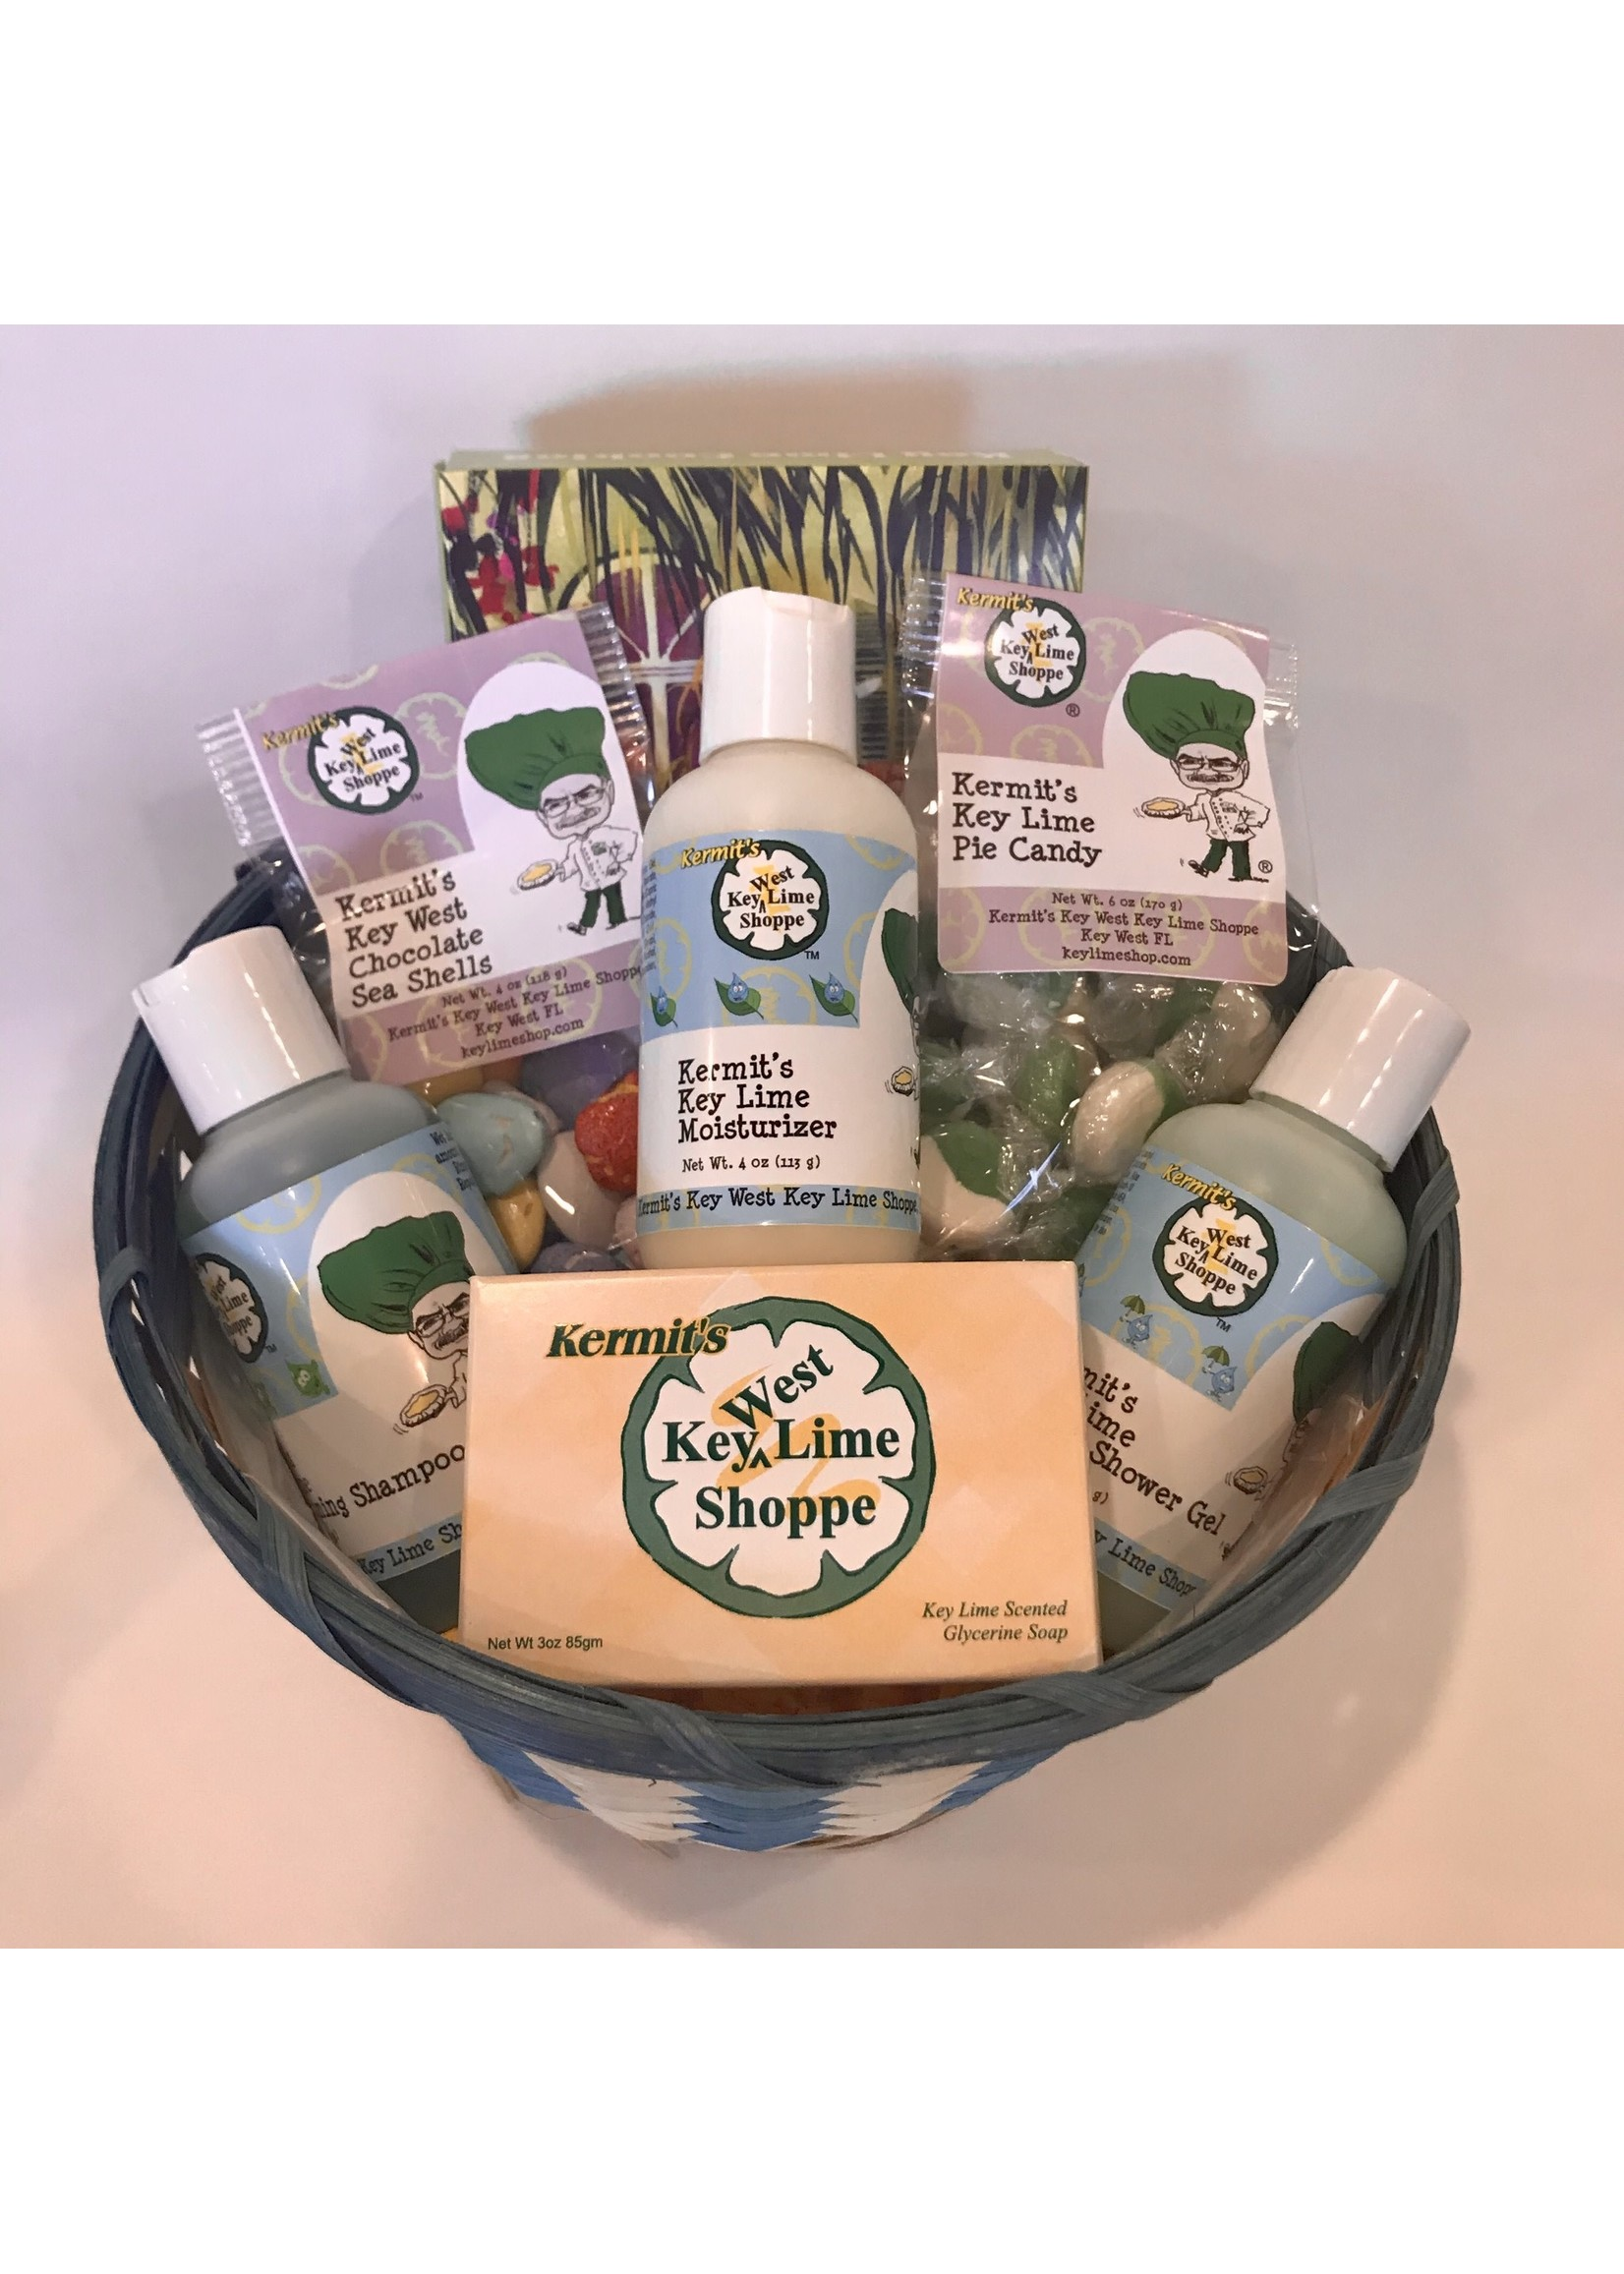 Kermit's Duval Delights Gift Basket